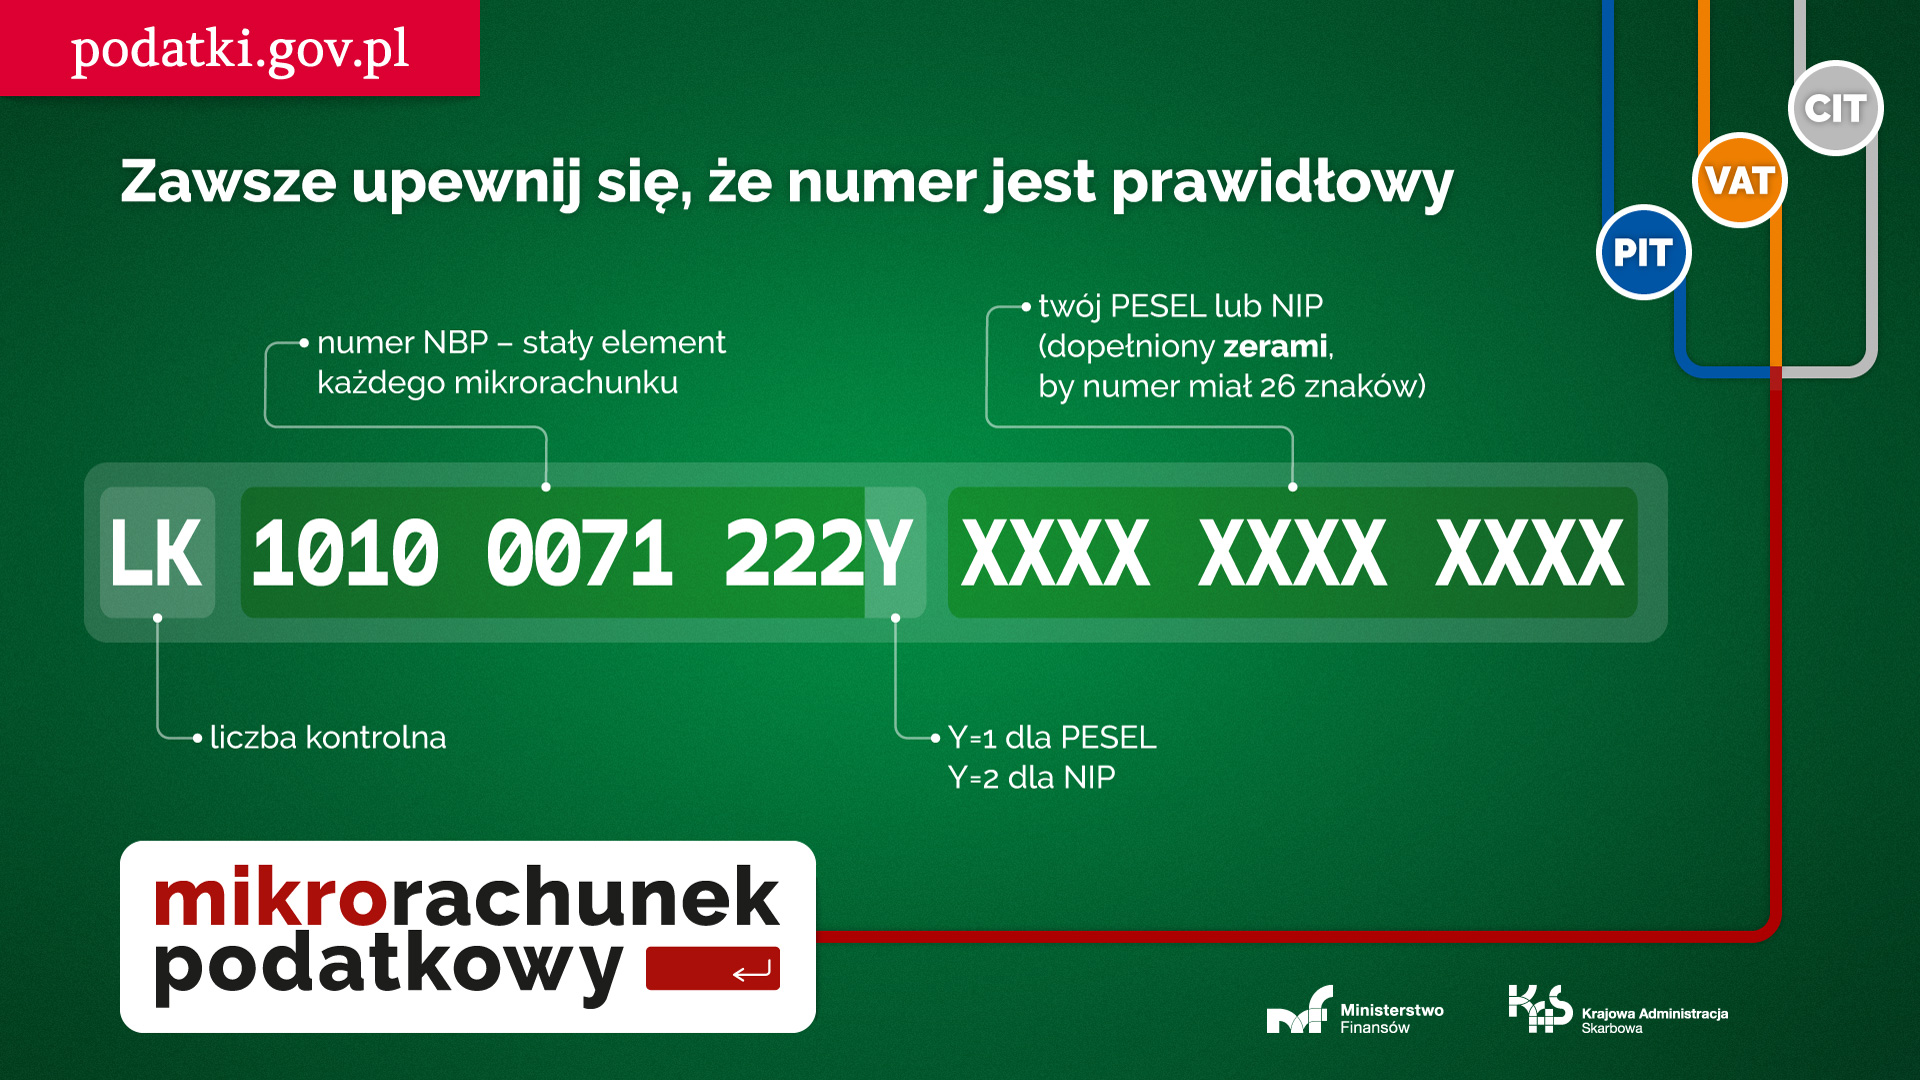 Mikrorachunek_podatkowy__TT_3